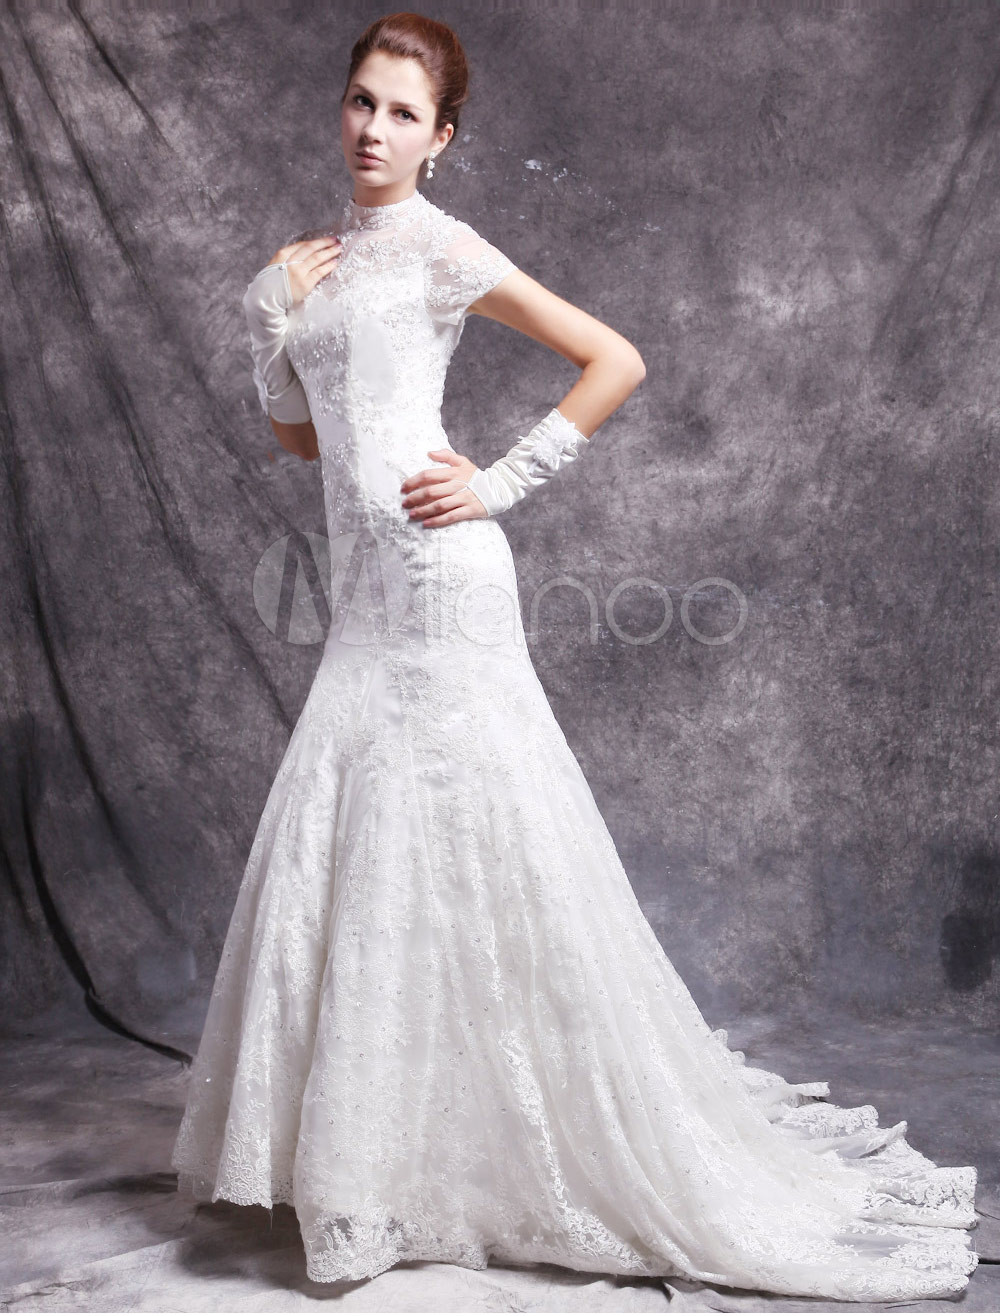 acd31c2ff17 Mermaid Wedding Dress With Short Sleeves